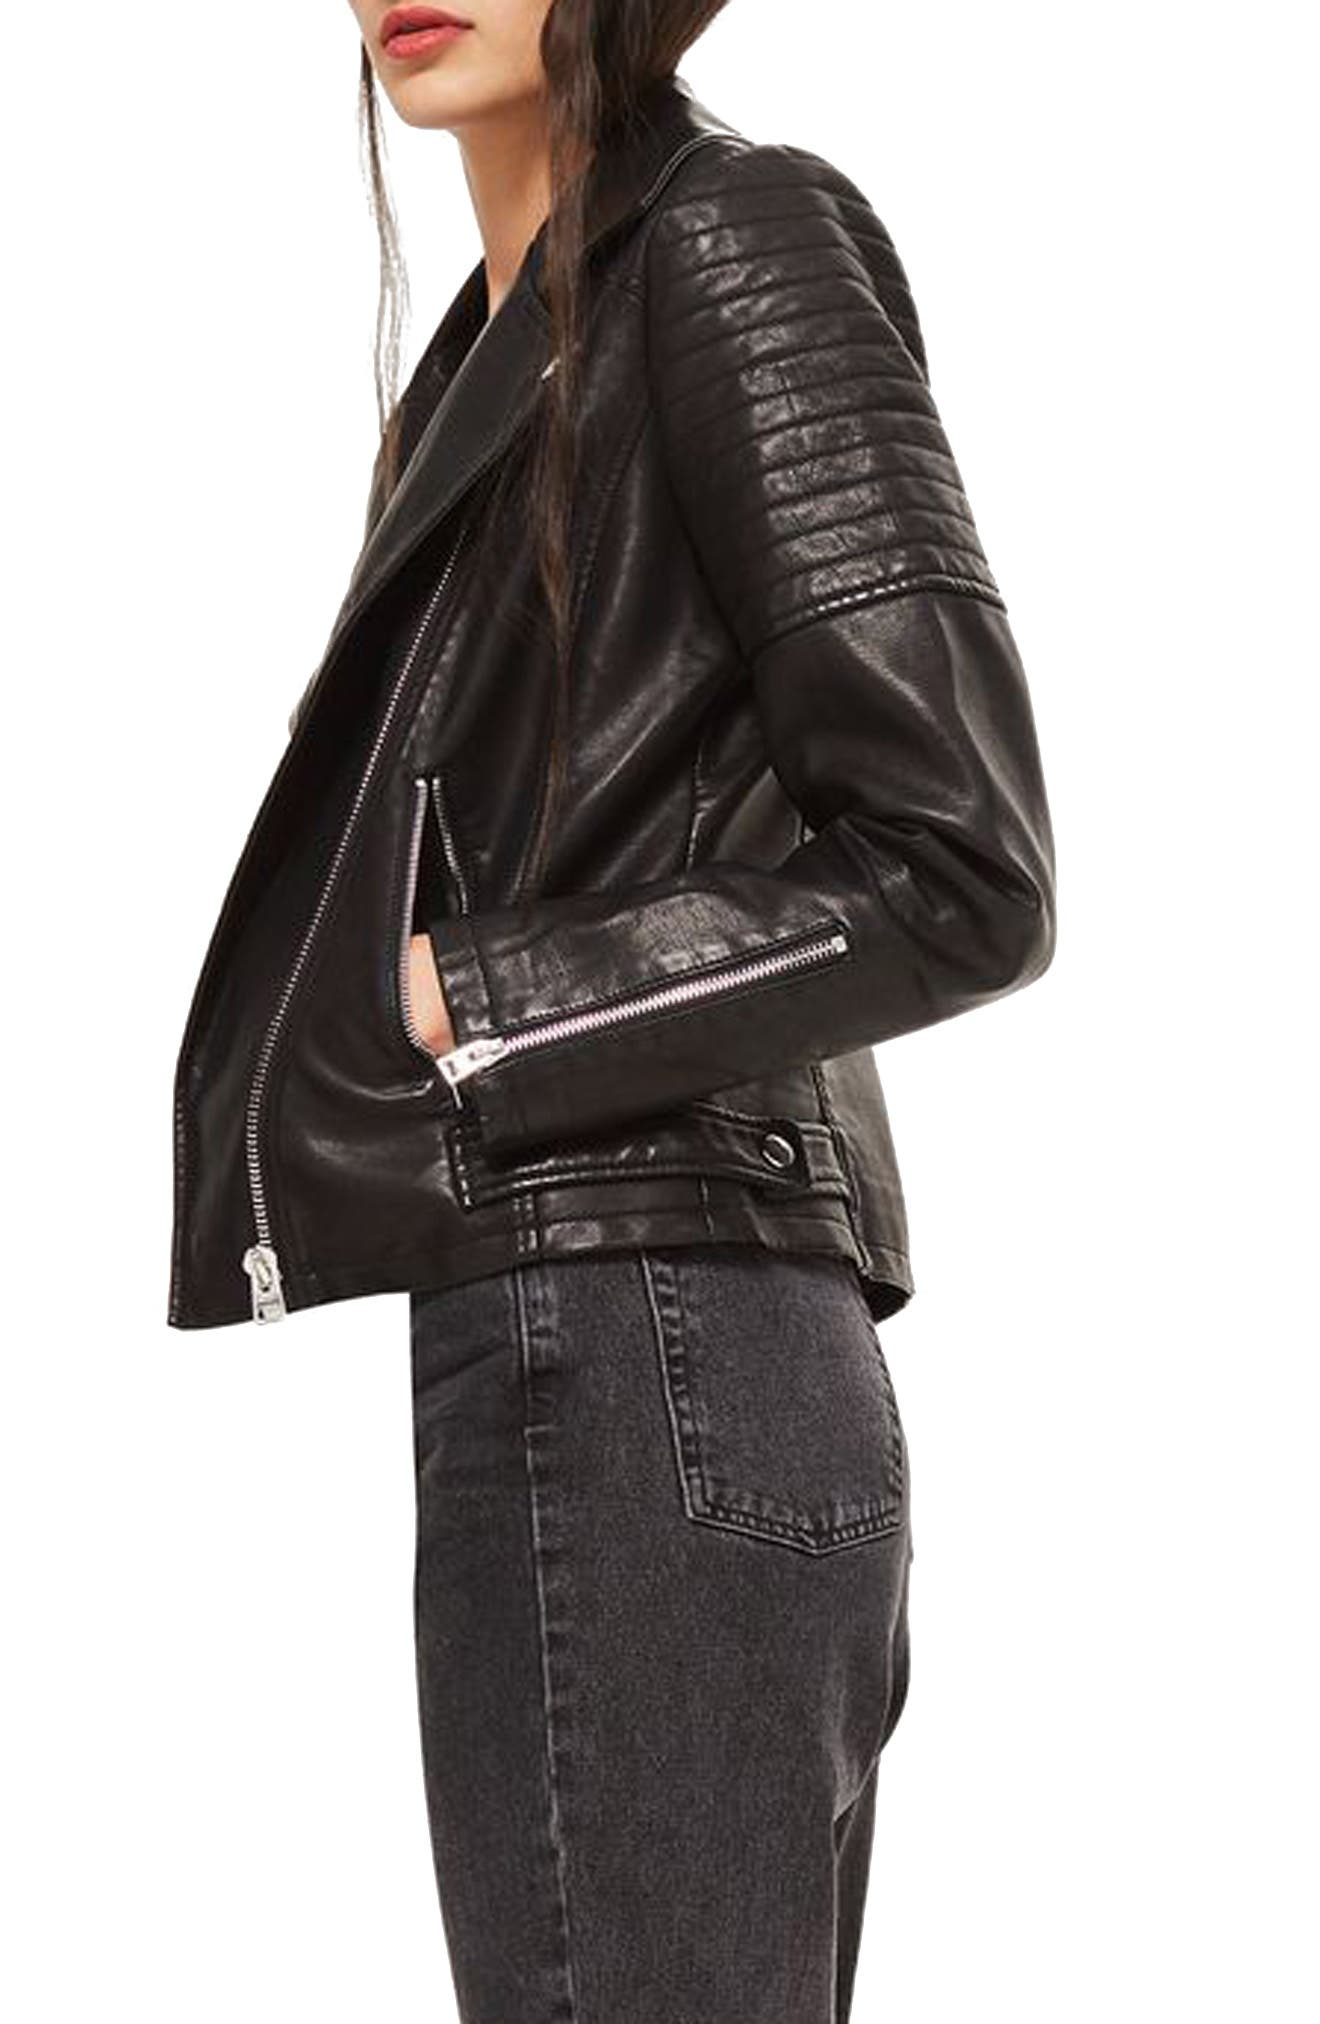 TOPSHOP, Blossom Faux Leather Biker Jacket, Alternate thumbnail 3, color, 001